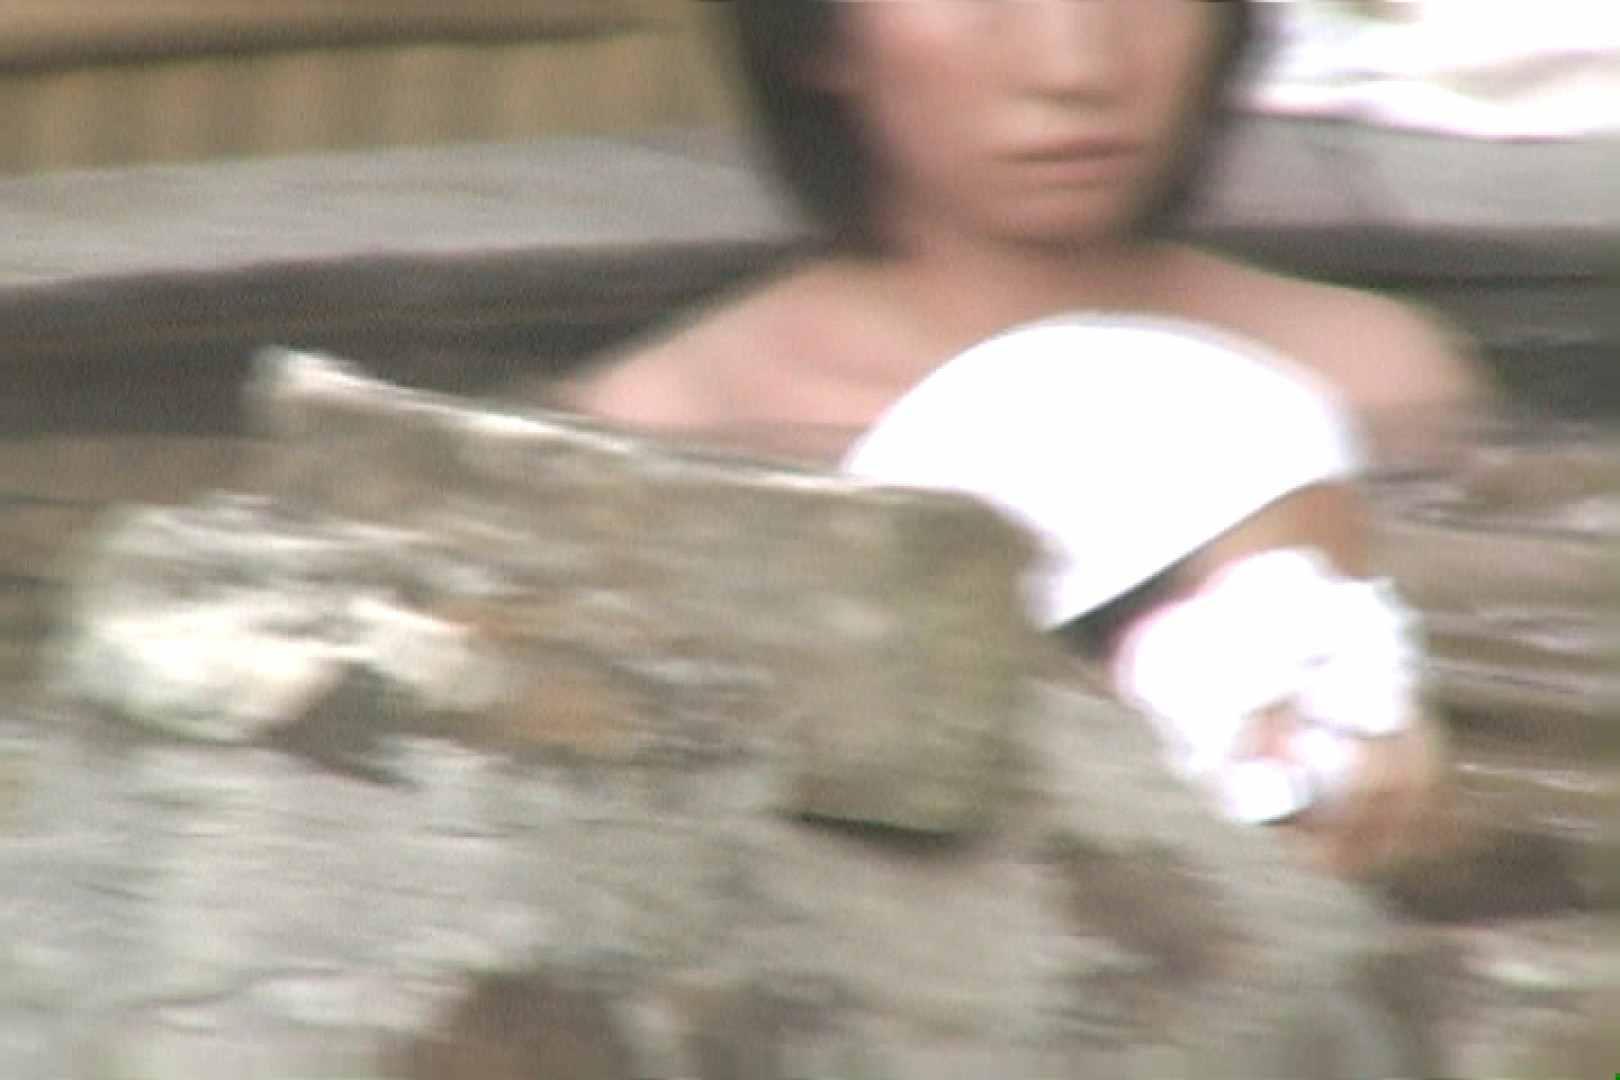 Aquaな露天風呂Vol.627 盗撮シリーズ | 露天風呂編  85PIX 19